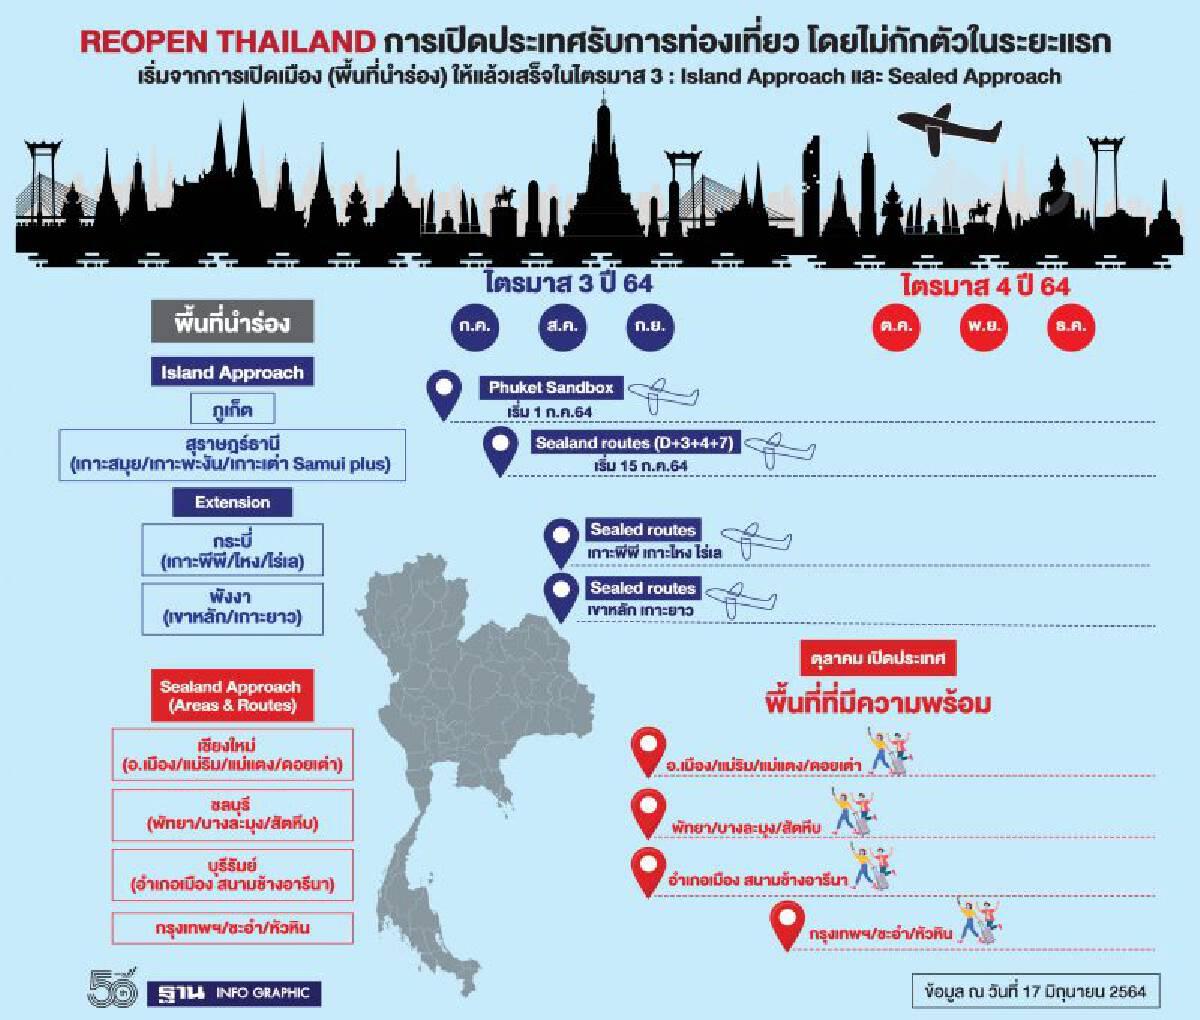 Reopen Thailand